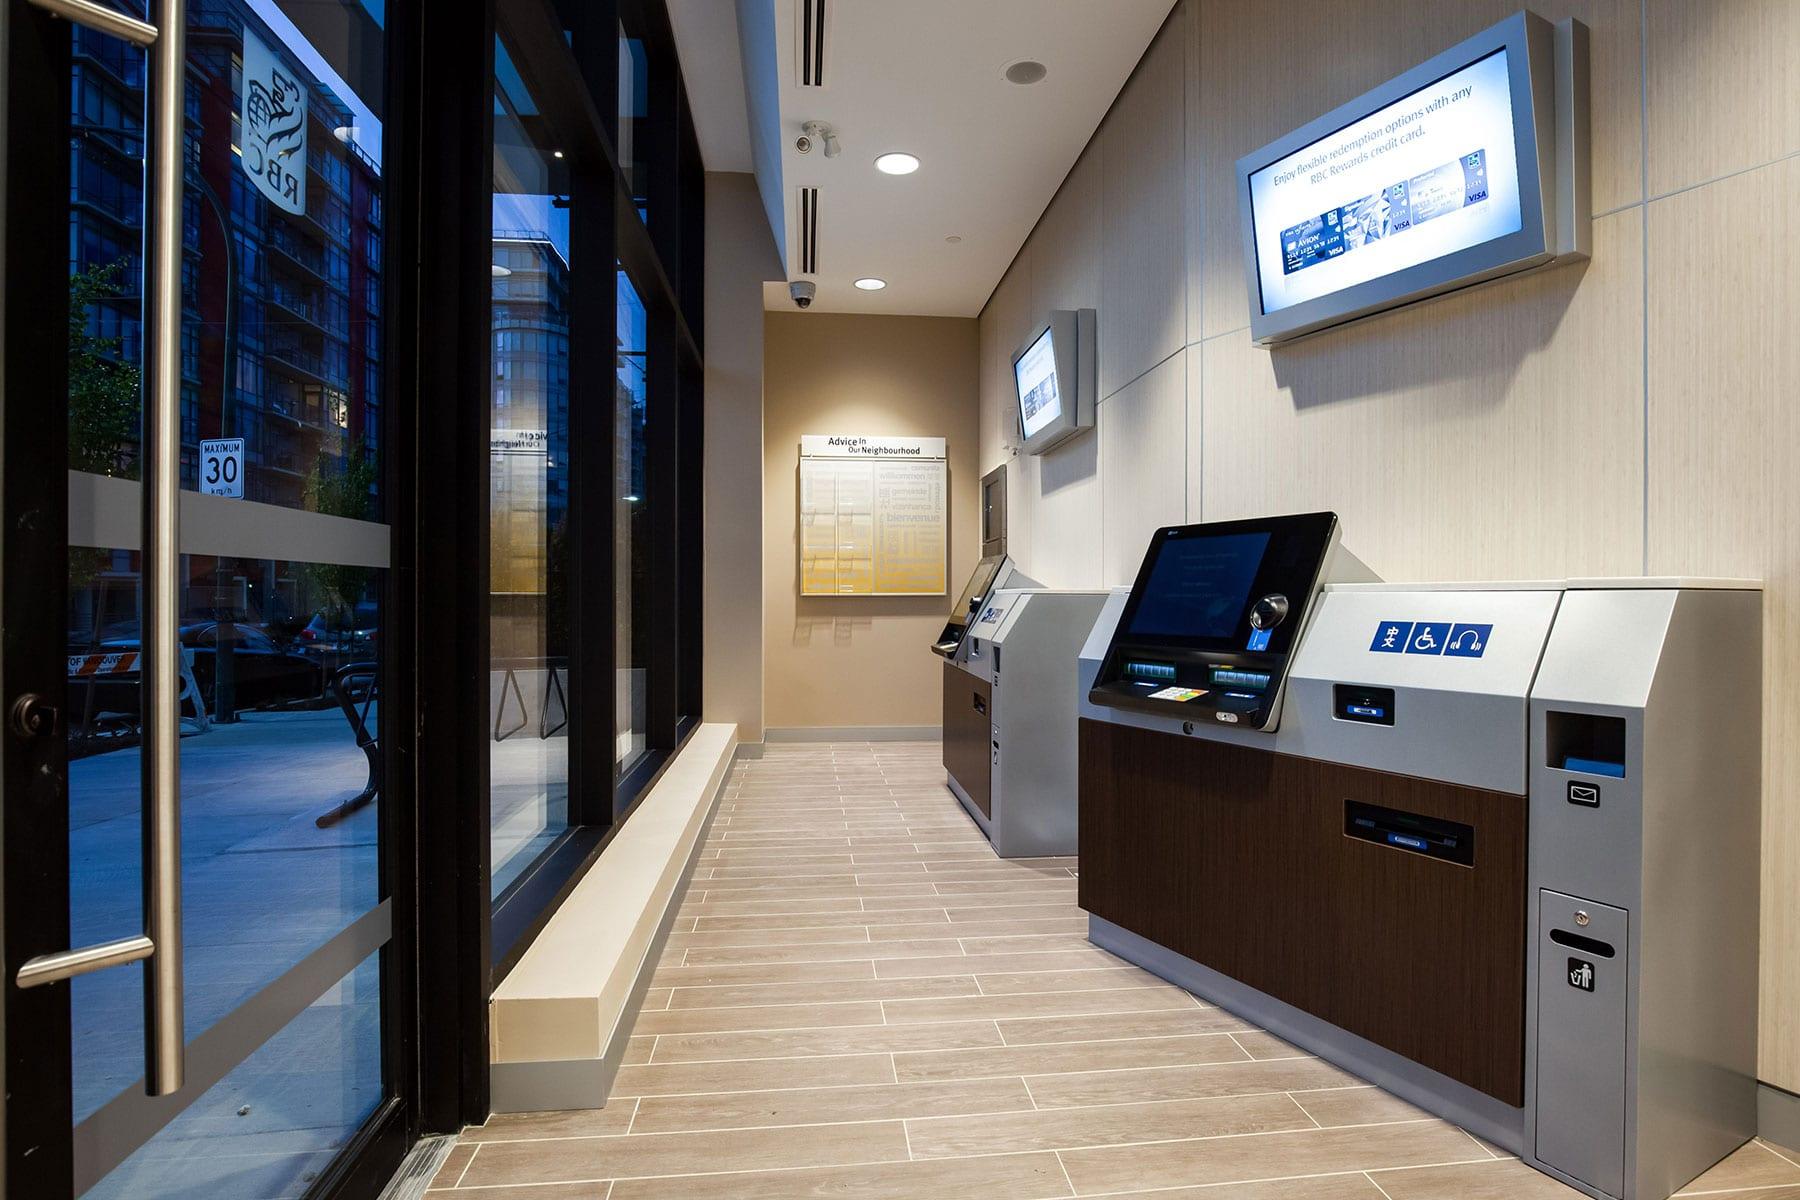 RBC Royal Bank ATM machines